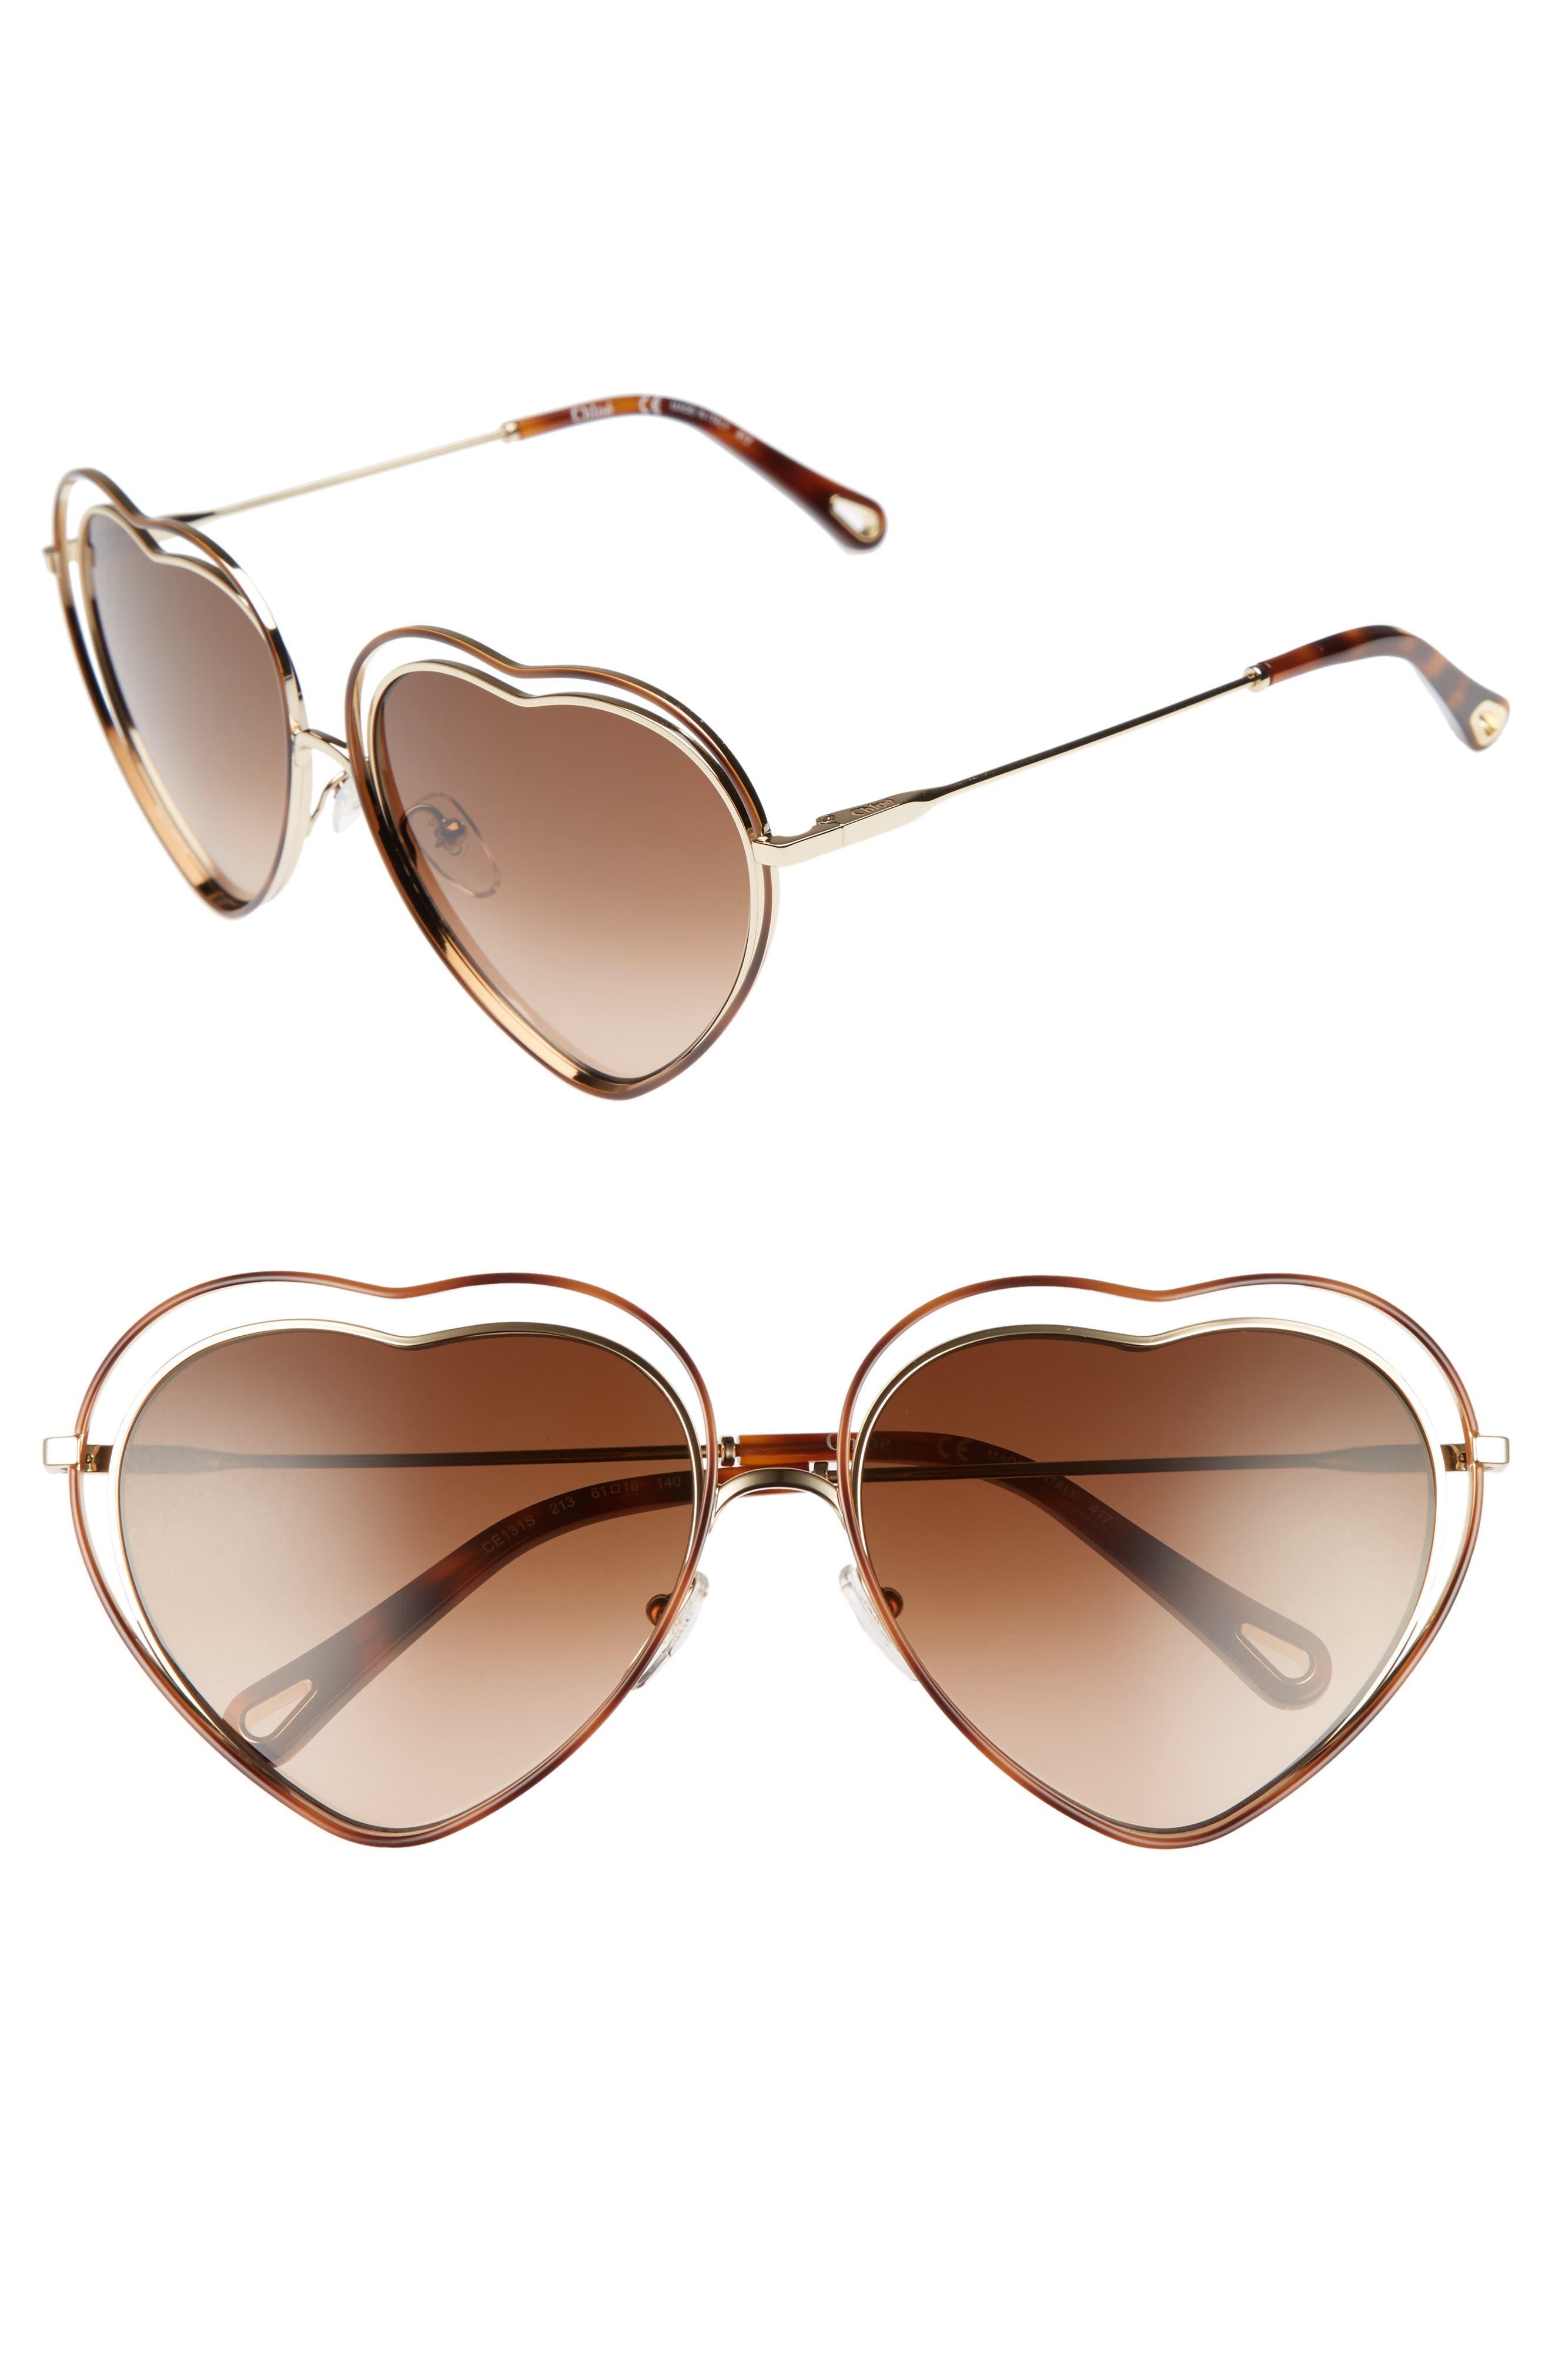 Poppy Love Heart Sunglasses,                             Main thumbnail 1, color,                             Havana Brown